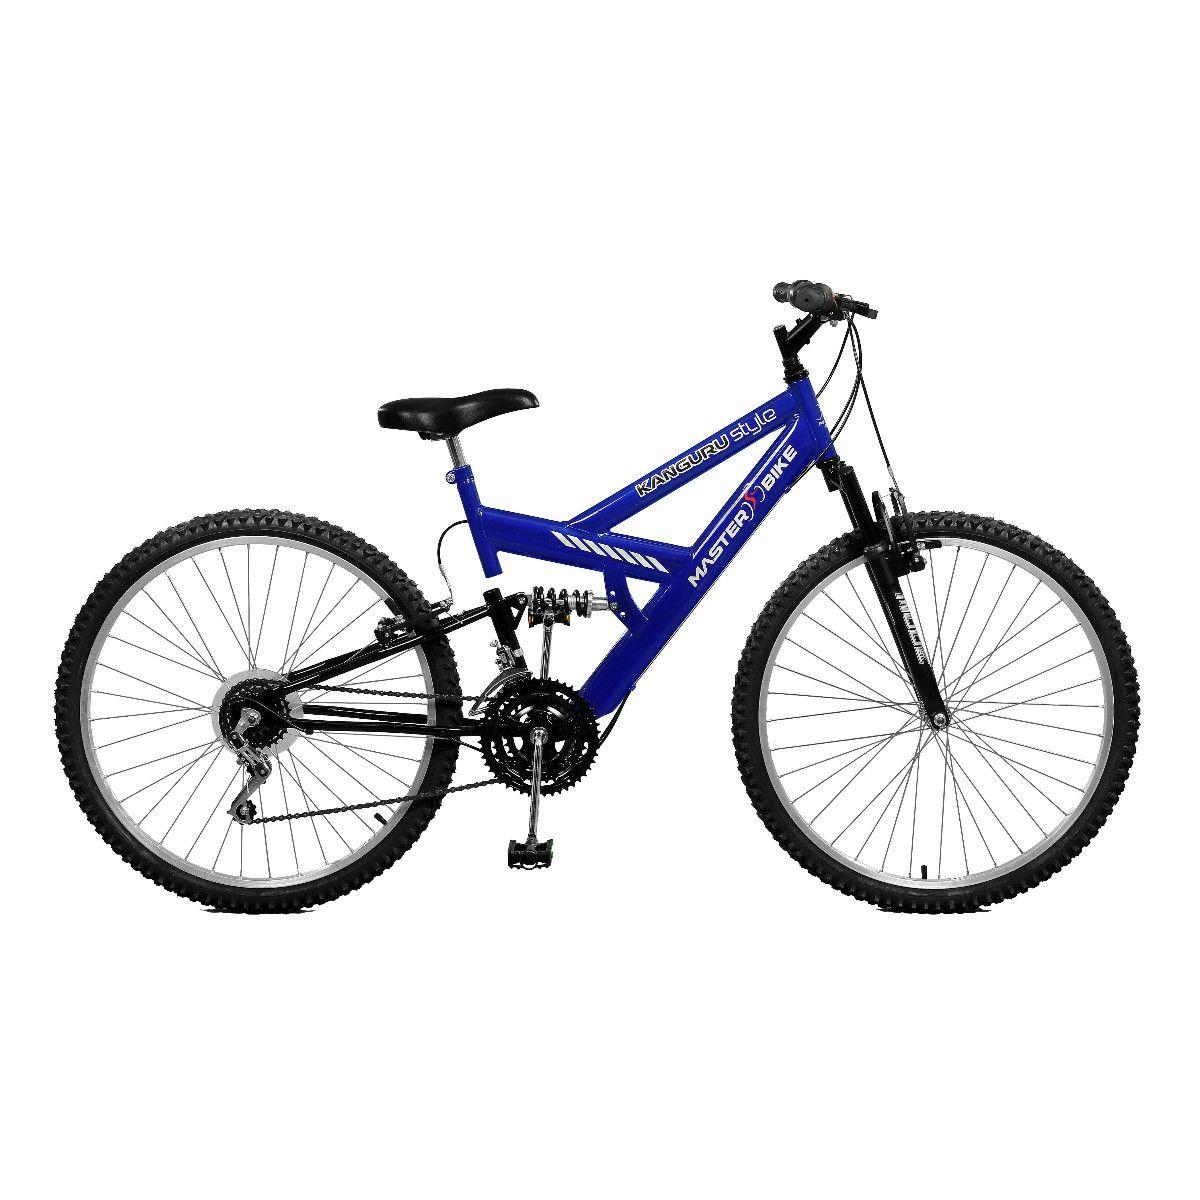 Bicicleta Master Bike Aro 26 Kanguru Style 21 Marchas V-Brake Azul/Preto